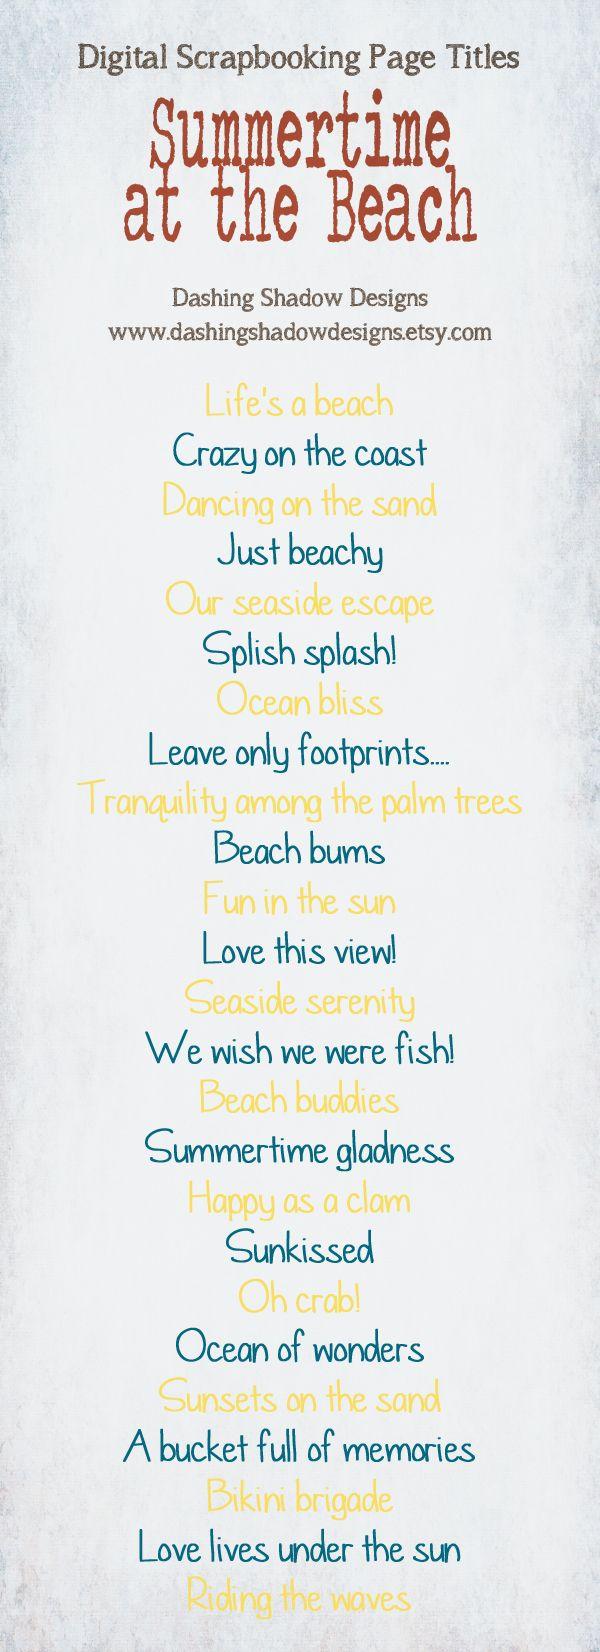 Scrapbook Page Title Ideas - Summertime at the Beach #digital #scrapbook #scrapbooking #title #titles #ideas #digiscrap #summer #beach #ocean #sea